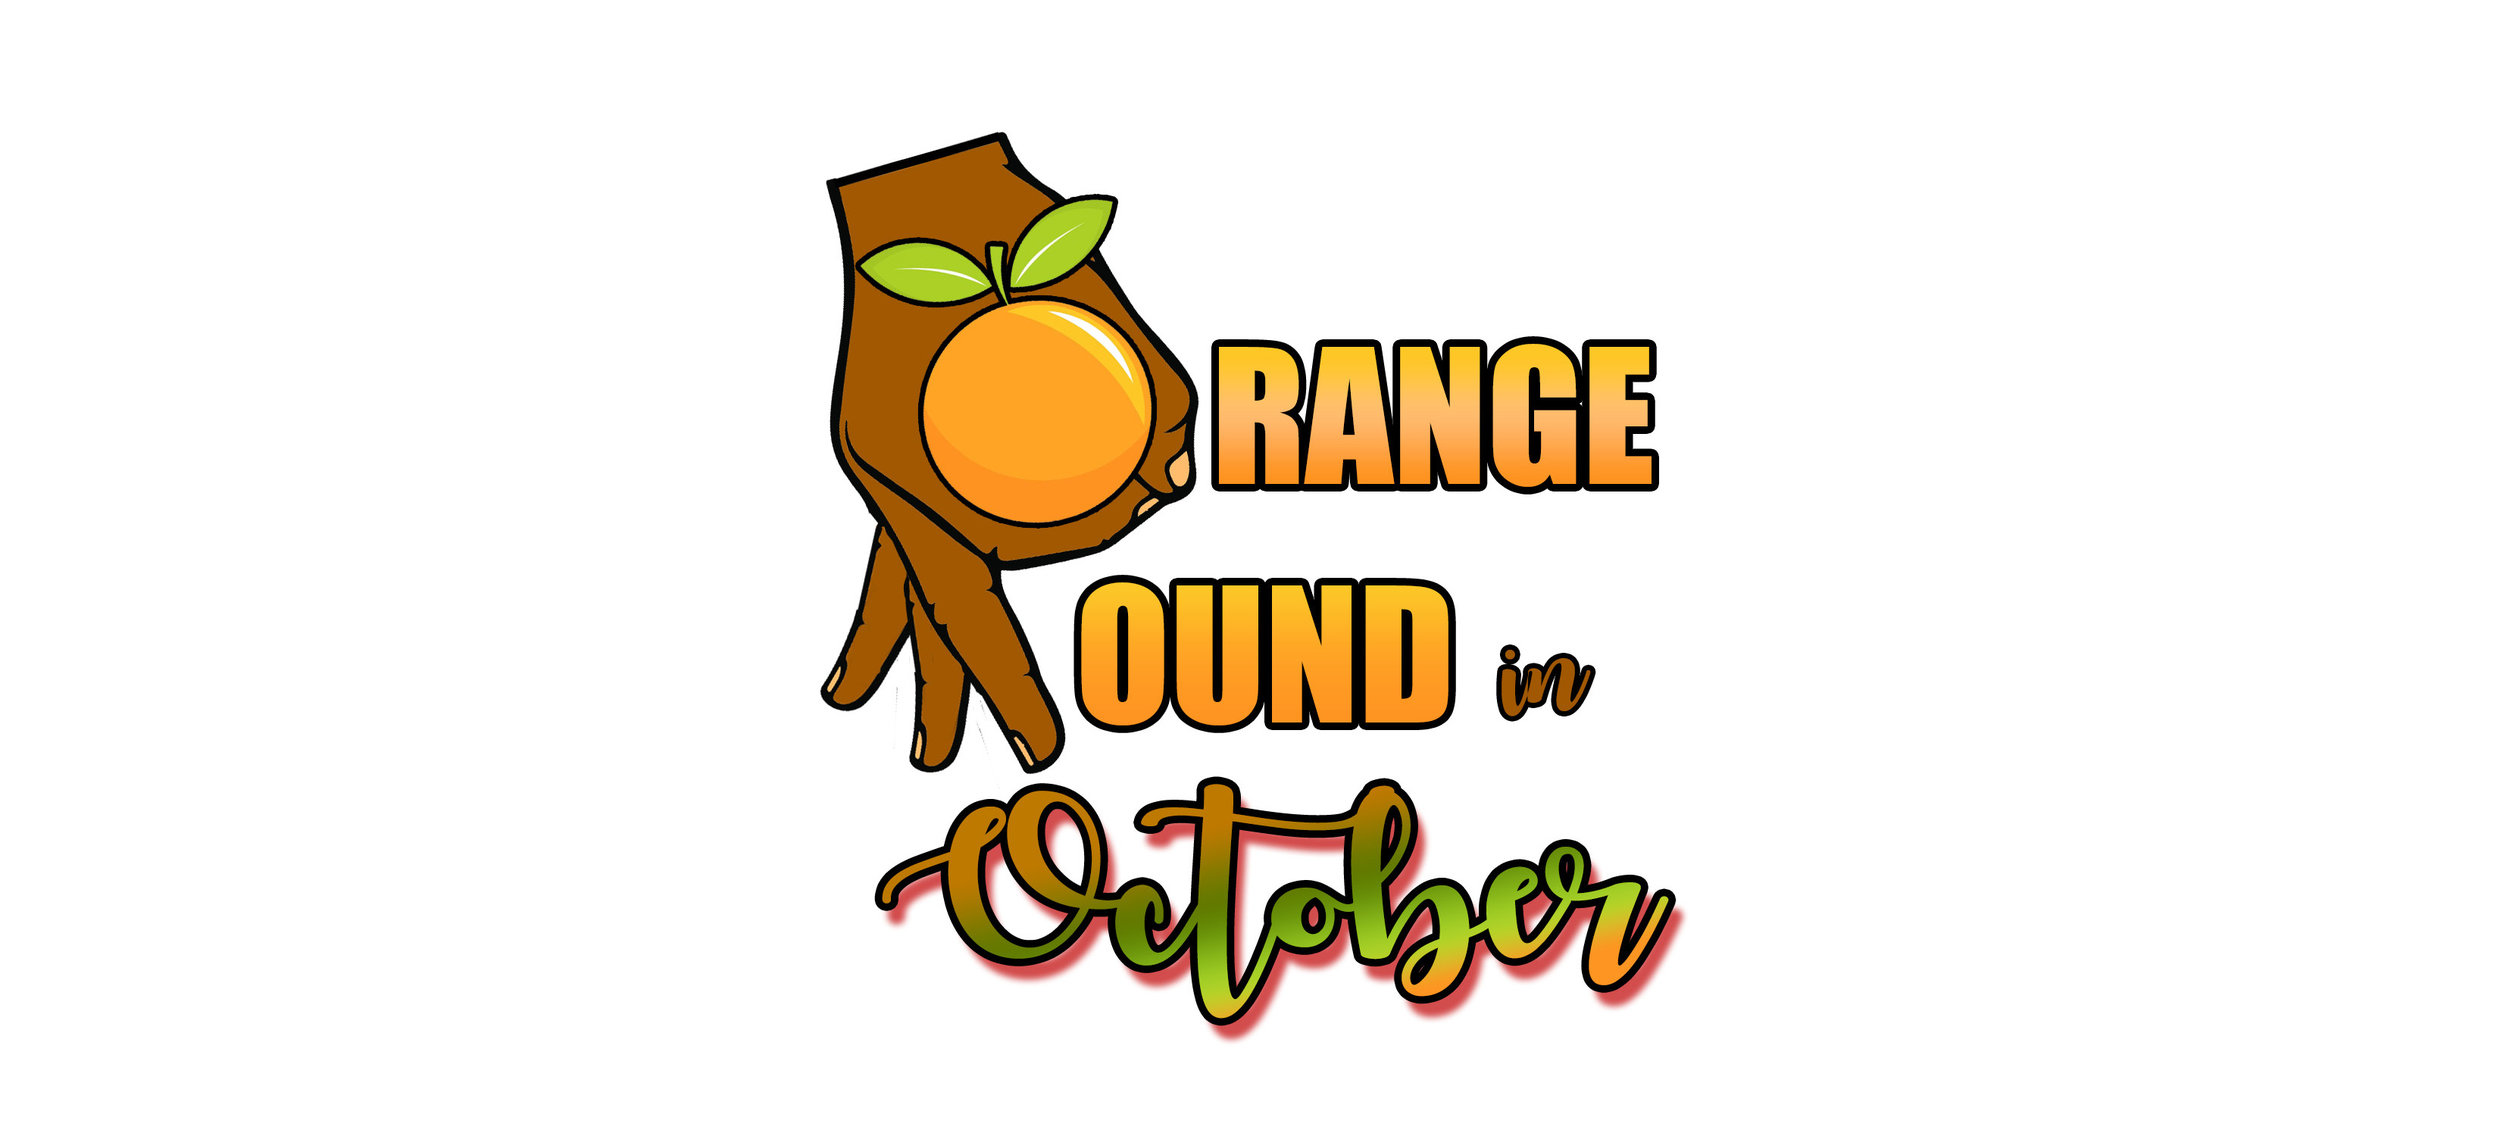 Orange mound logo 2 gallery.JPG